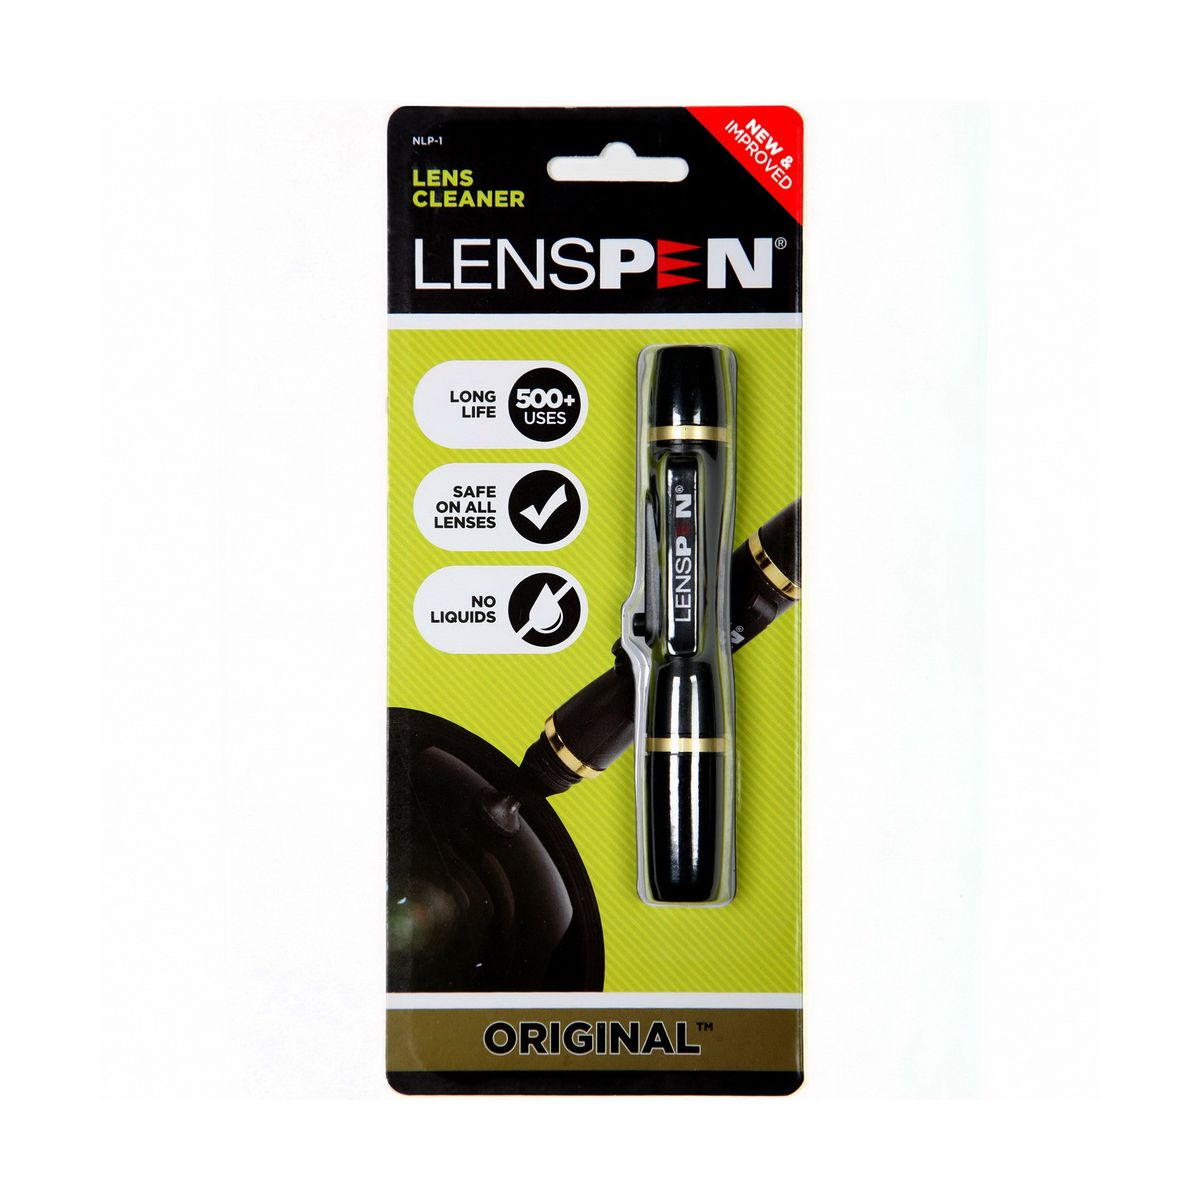 Nettoyage optique lenspen original - nettoyeur carbone 14mm